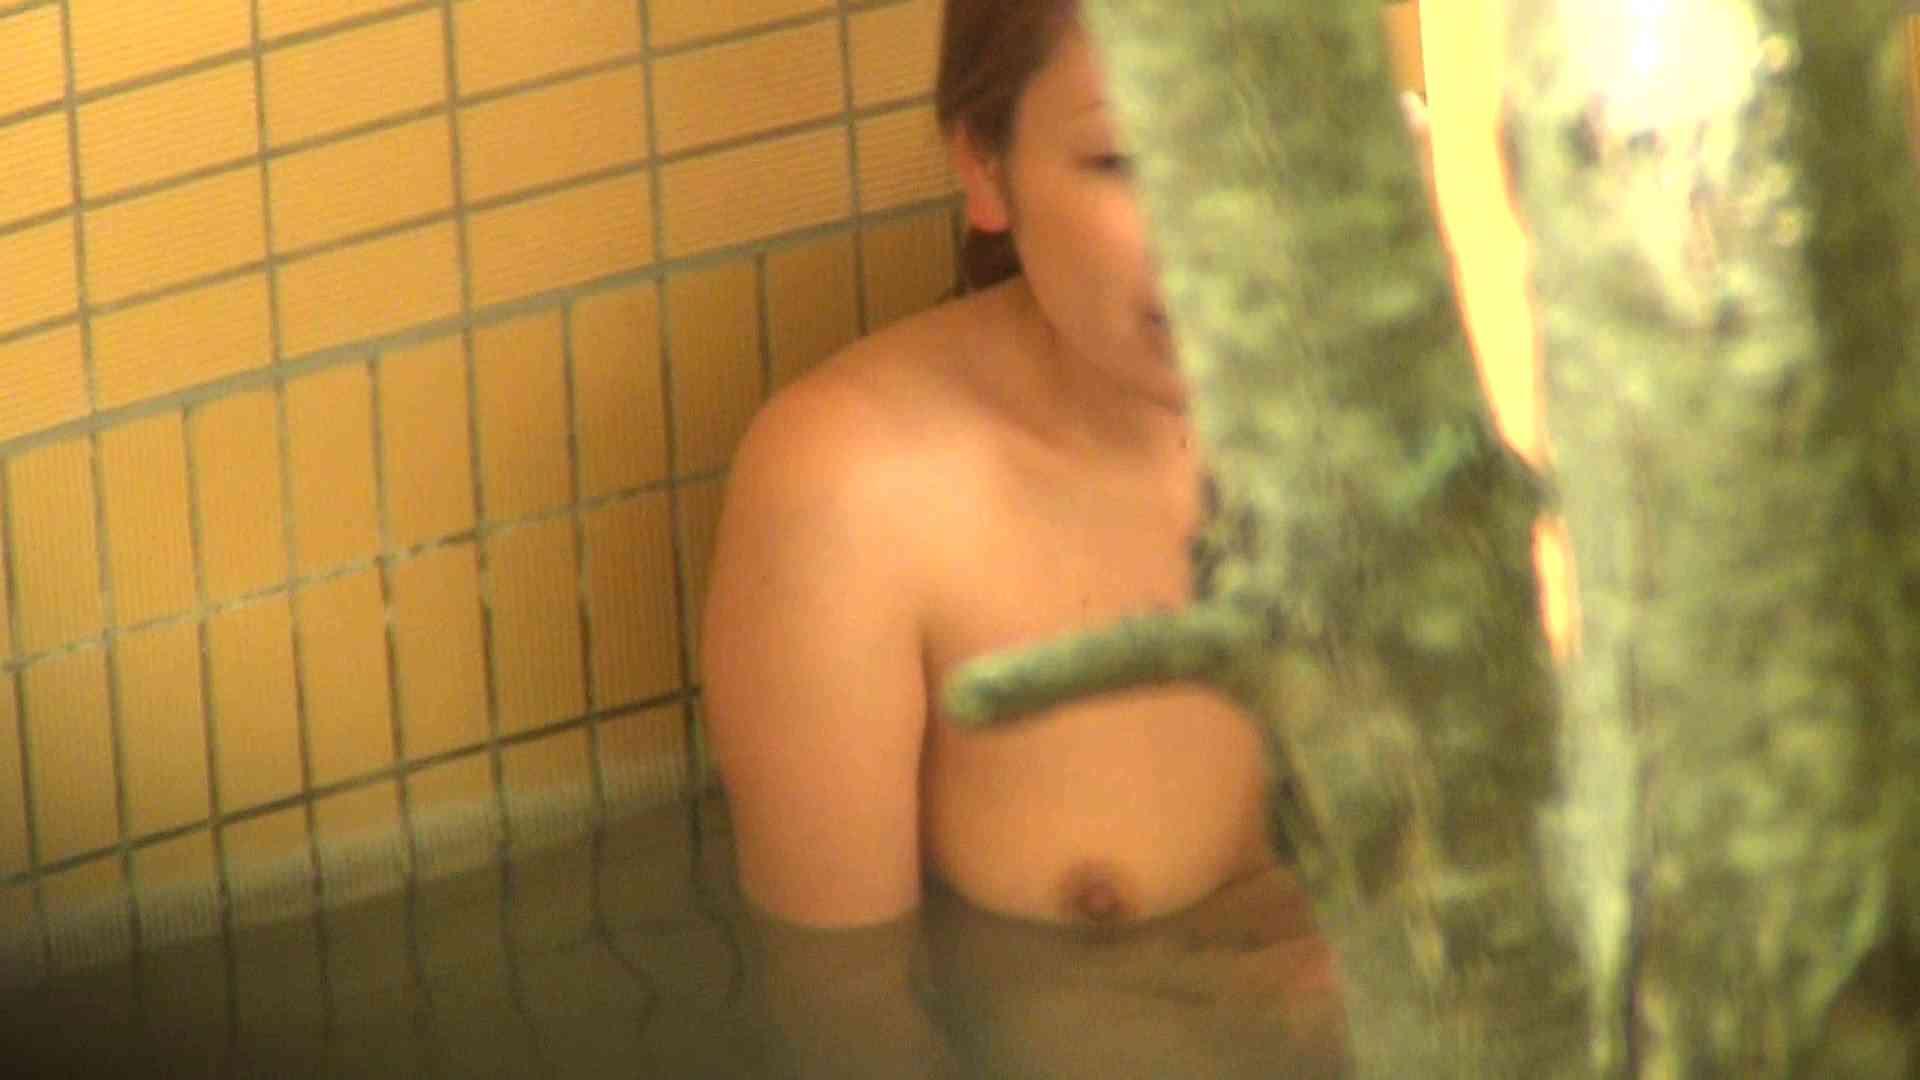 Aquaな露天風呂Vol.295 0   0  85連発 47